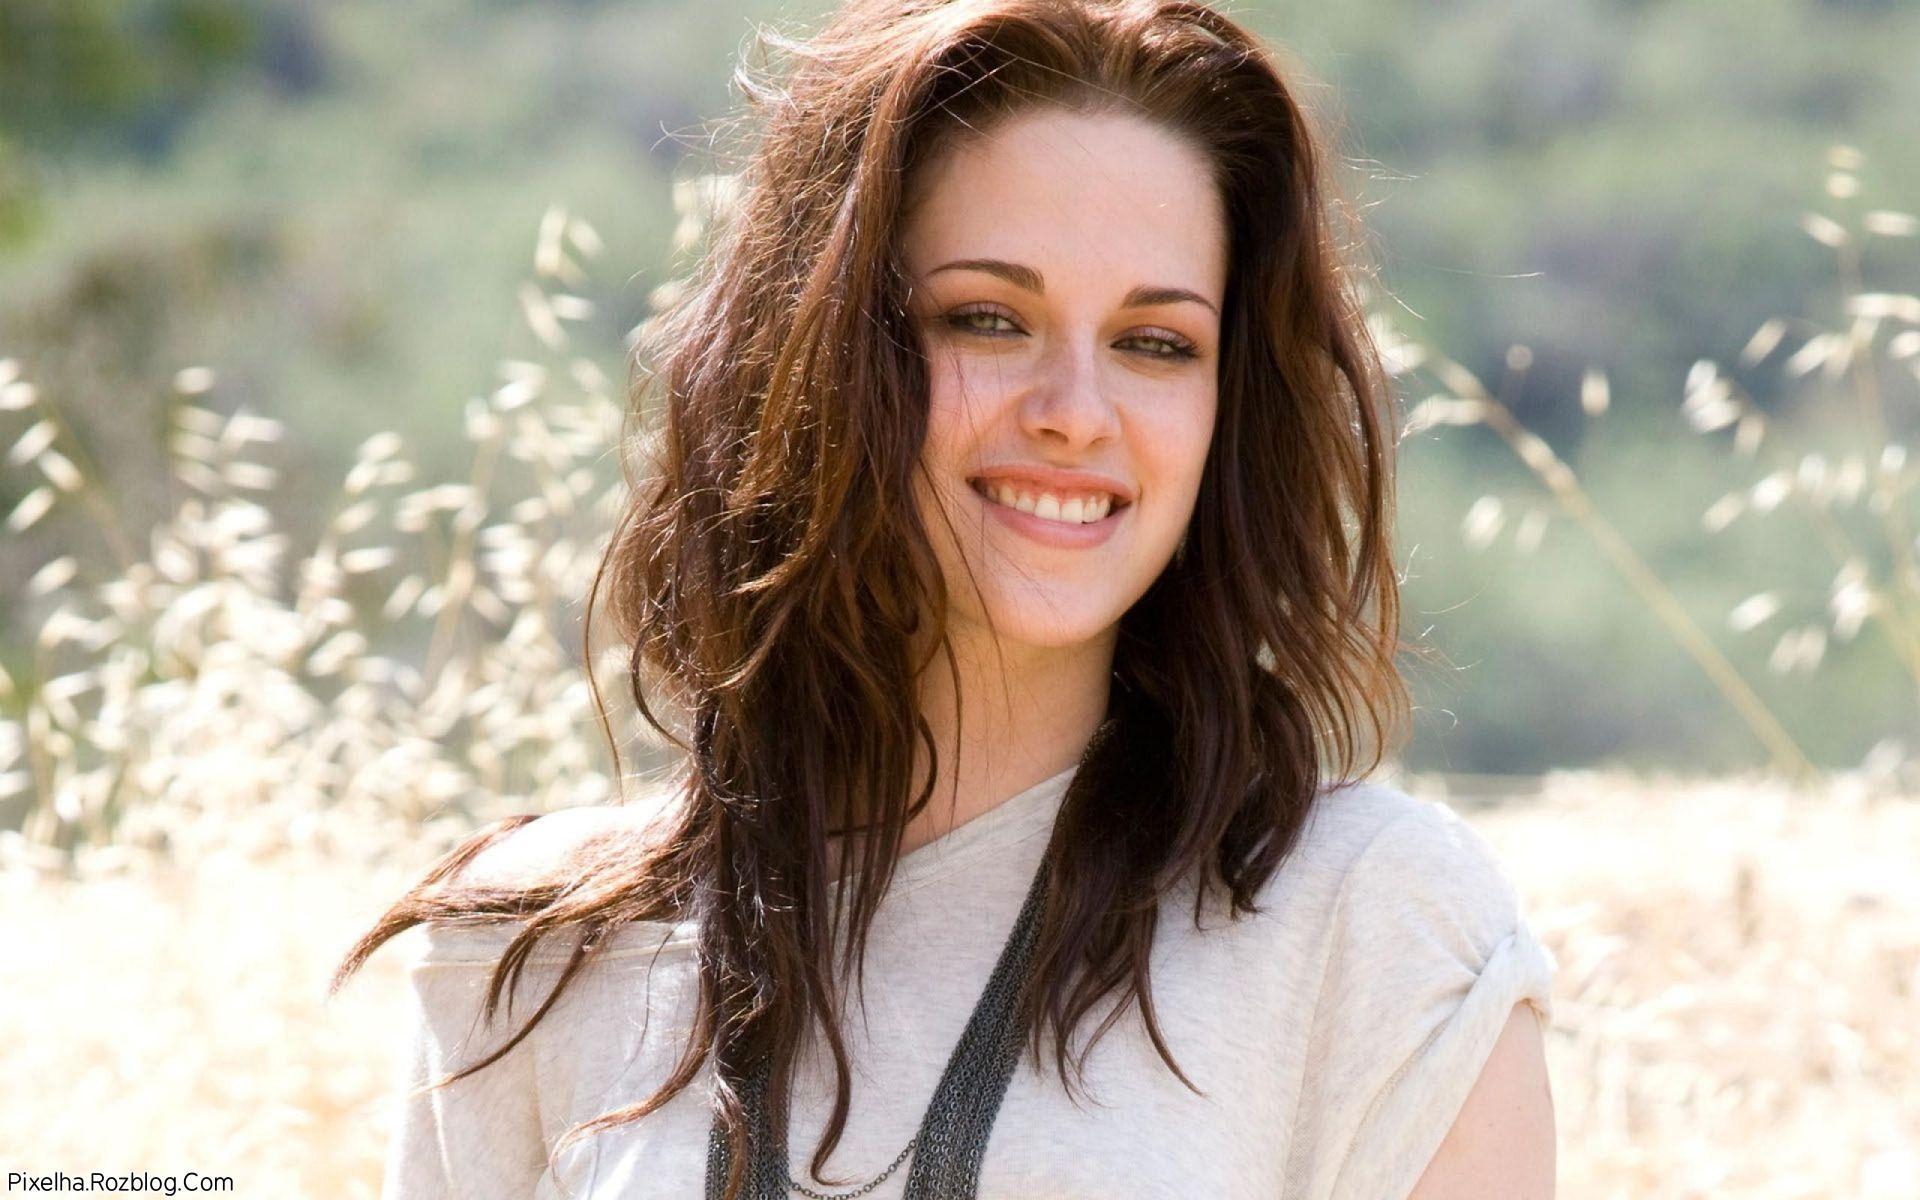 عکس جدید کریستین استوارت (Kristen Stewart)